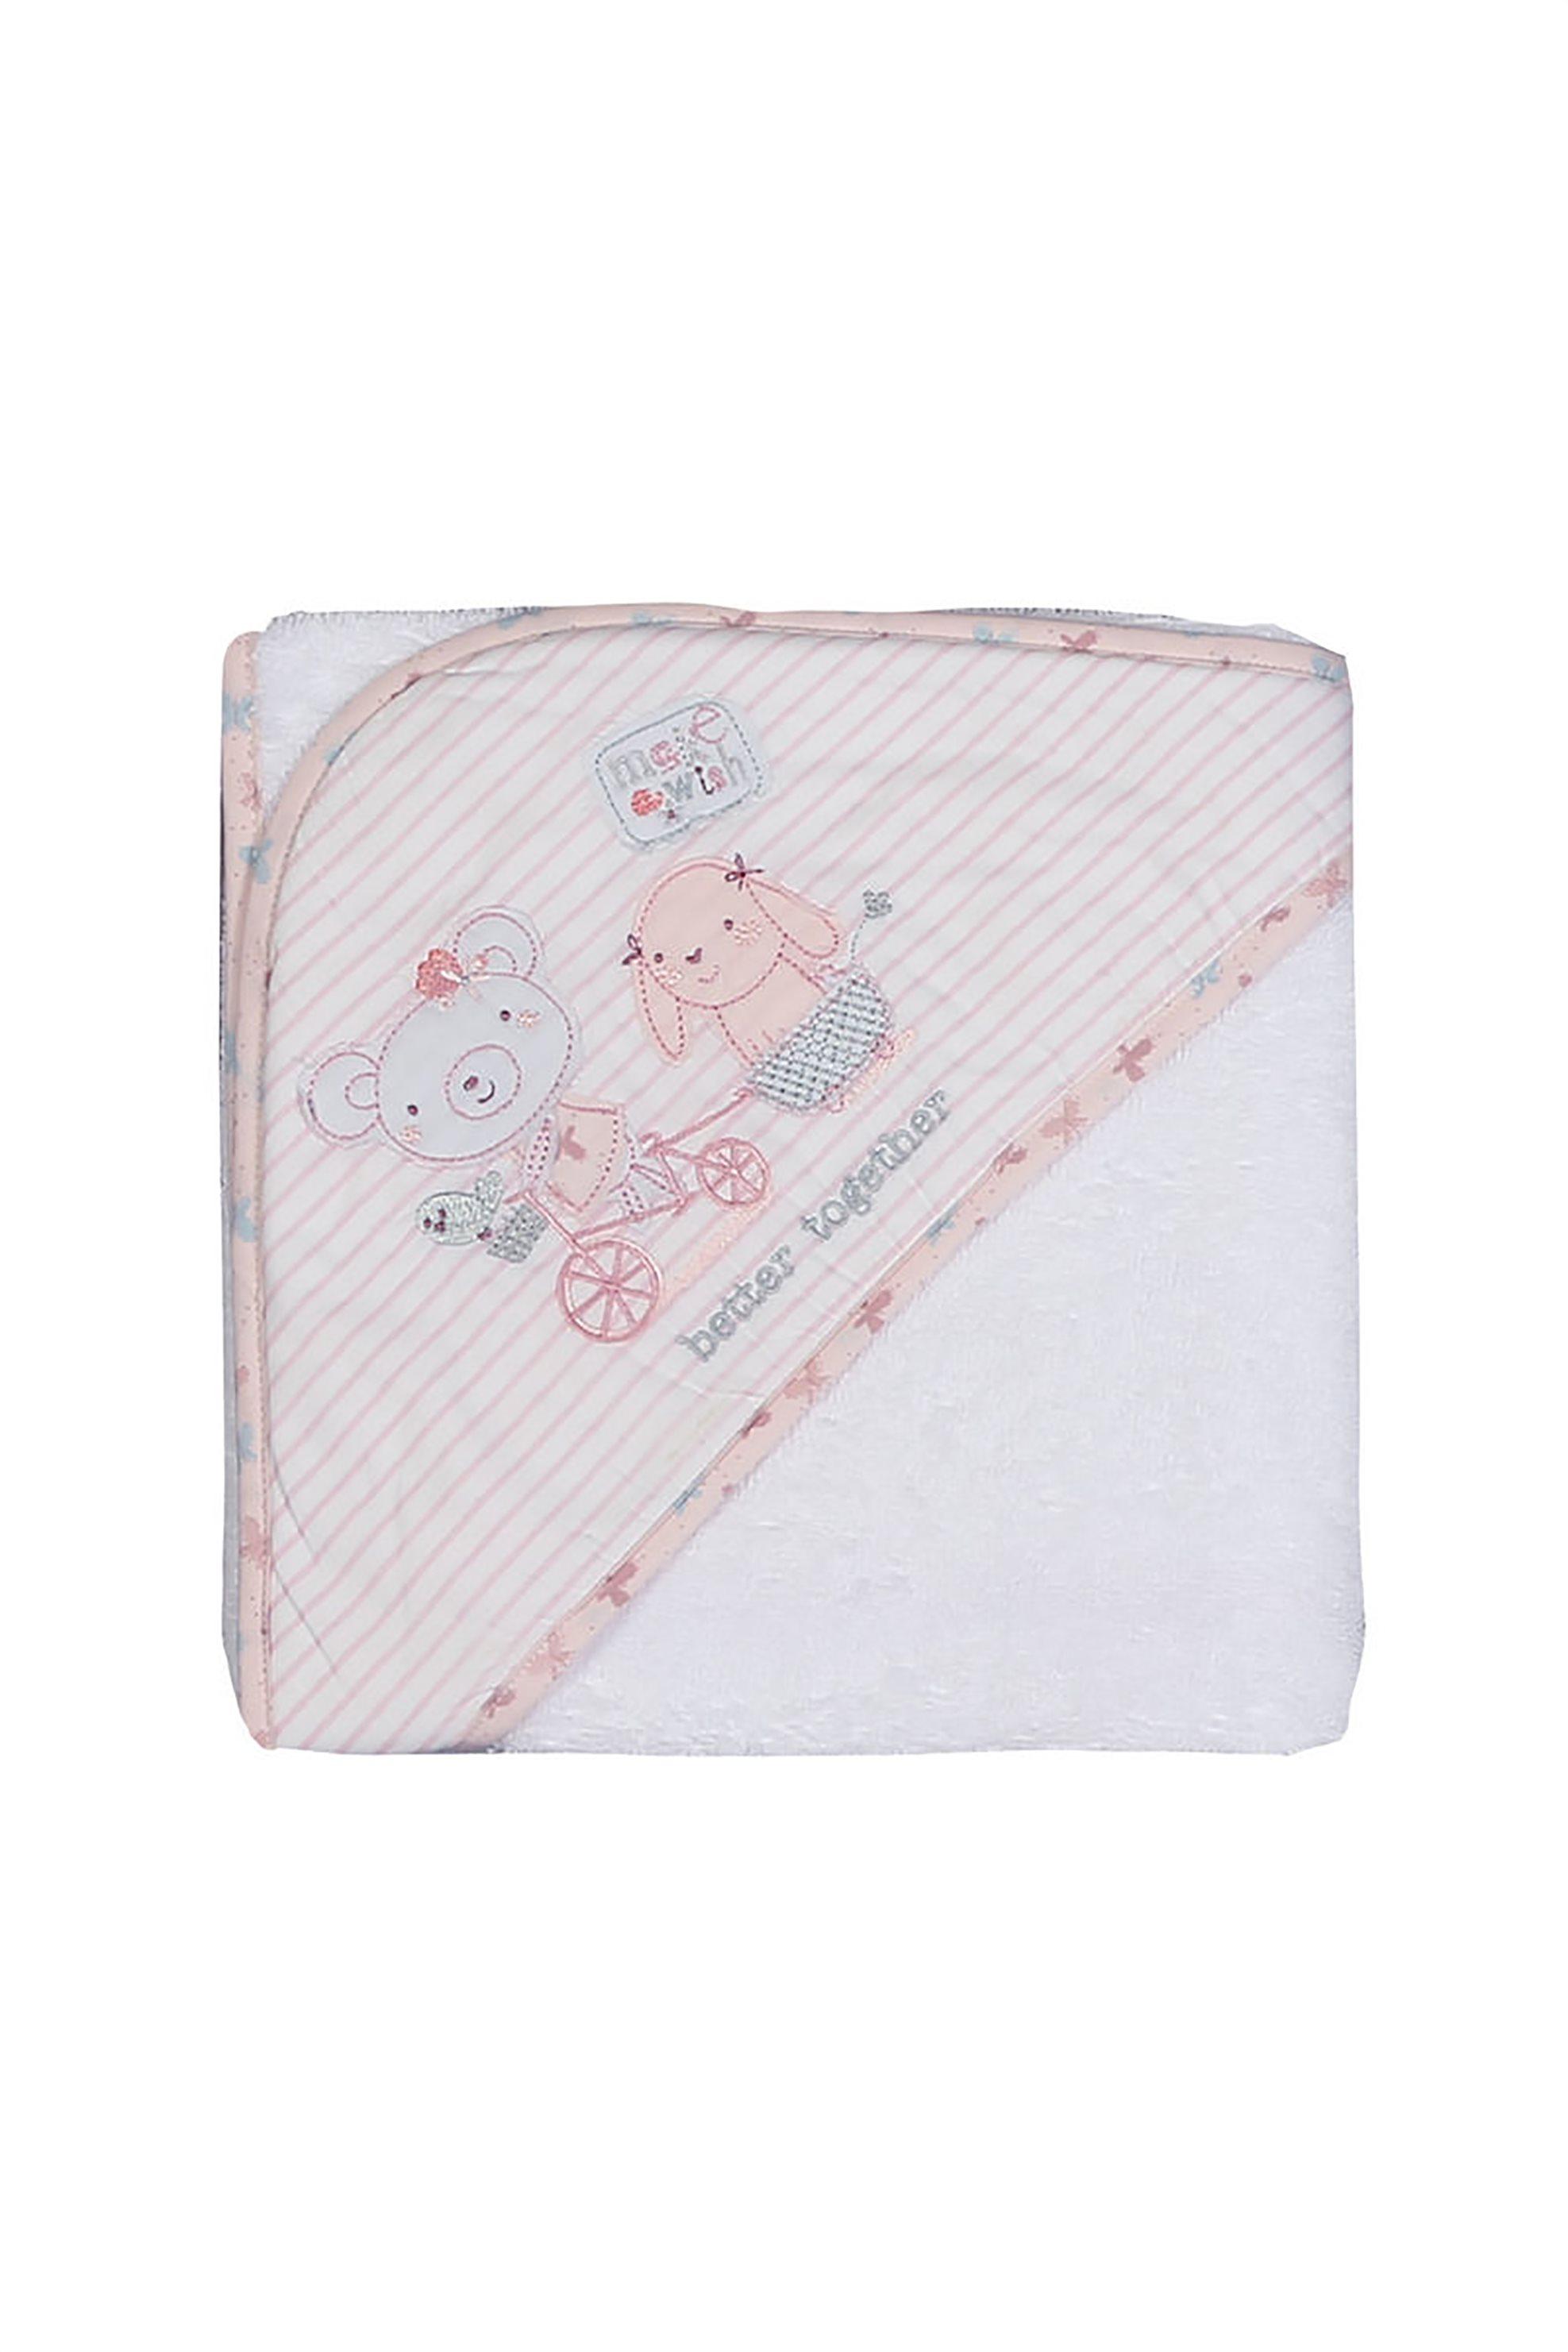 NEF-NEF Βρεφική κάπα Better Together(75x75)  - 021476 - Λευκό home   παιδια   παιδικά μπουρνούζια   ρόμπες   πετσέτες